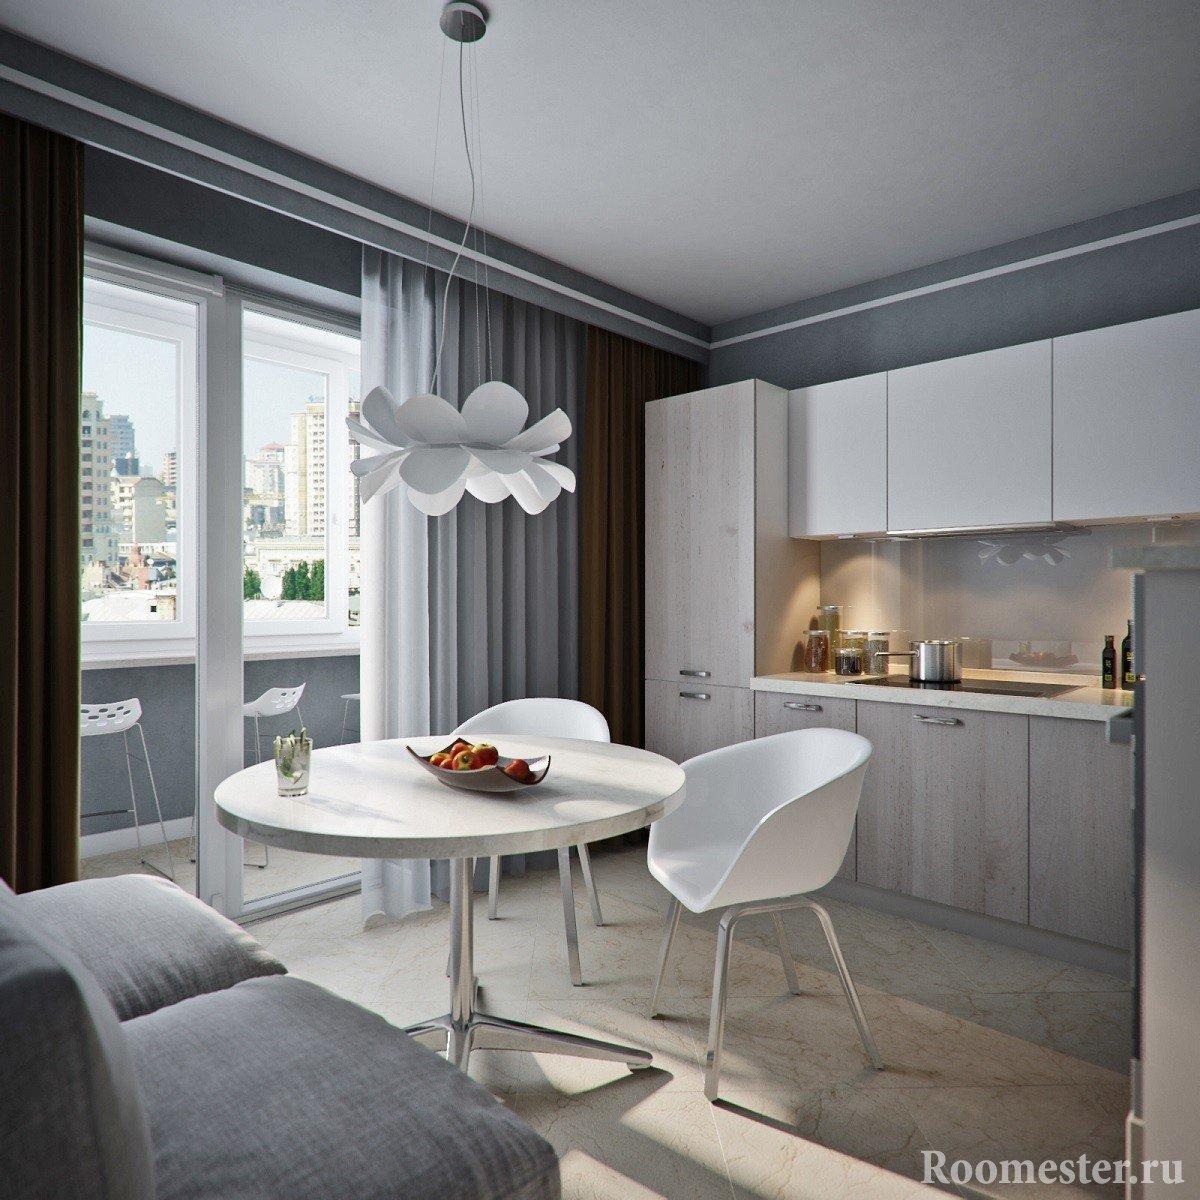 Панорамное остекление на лоджию из кухни